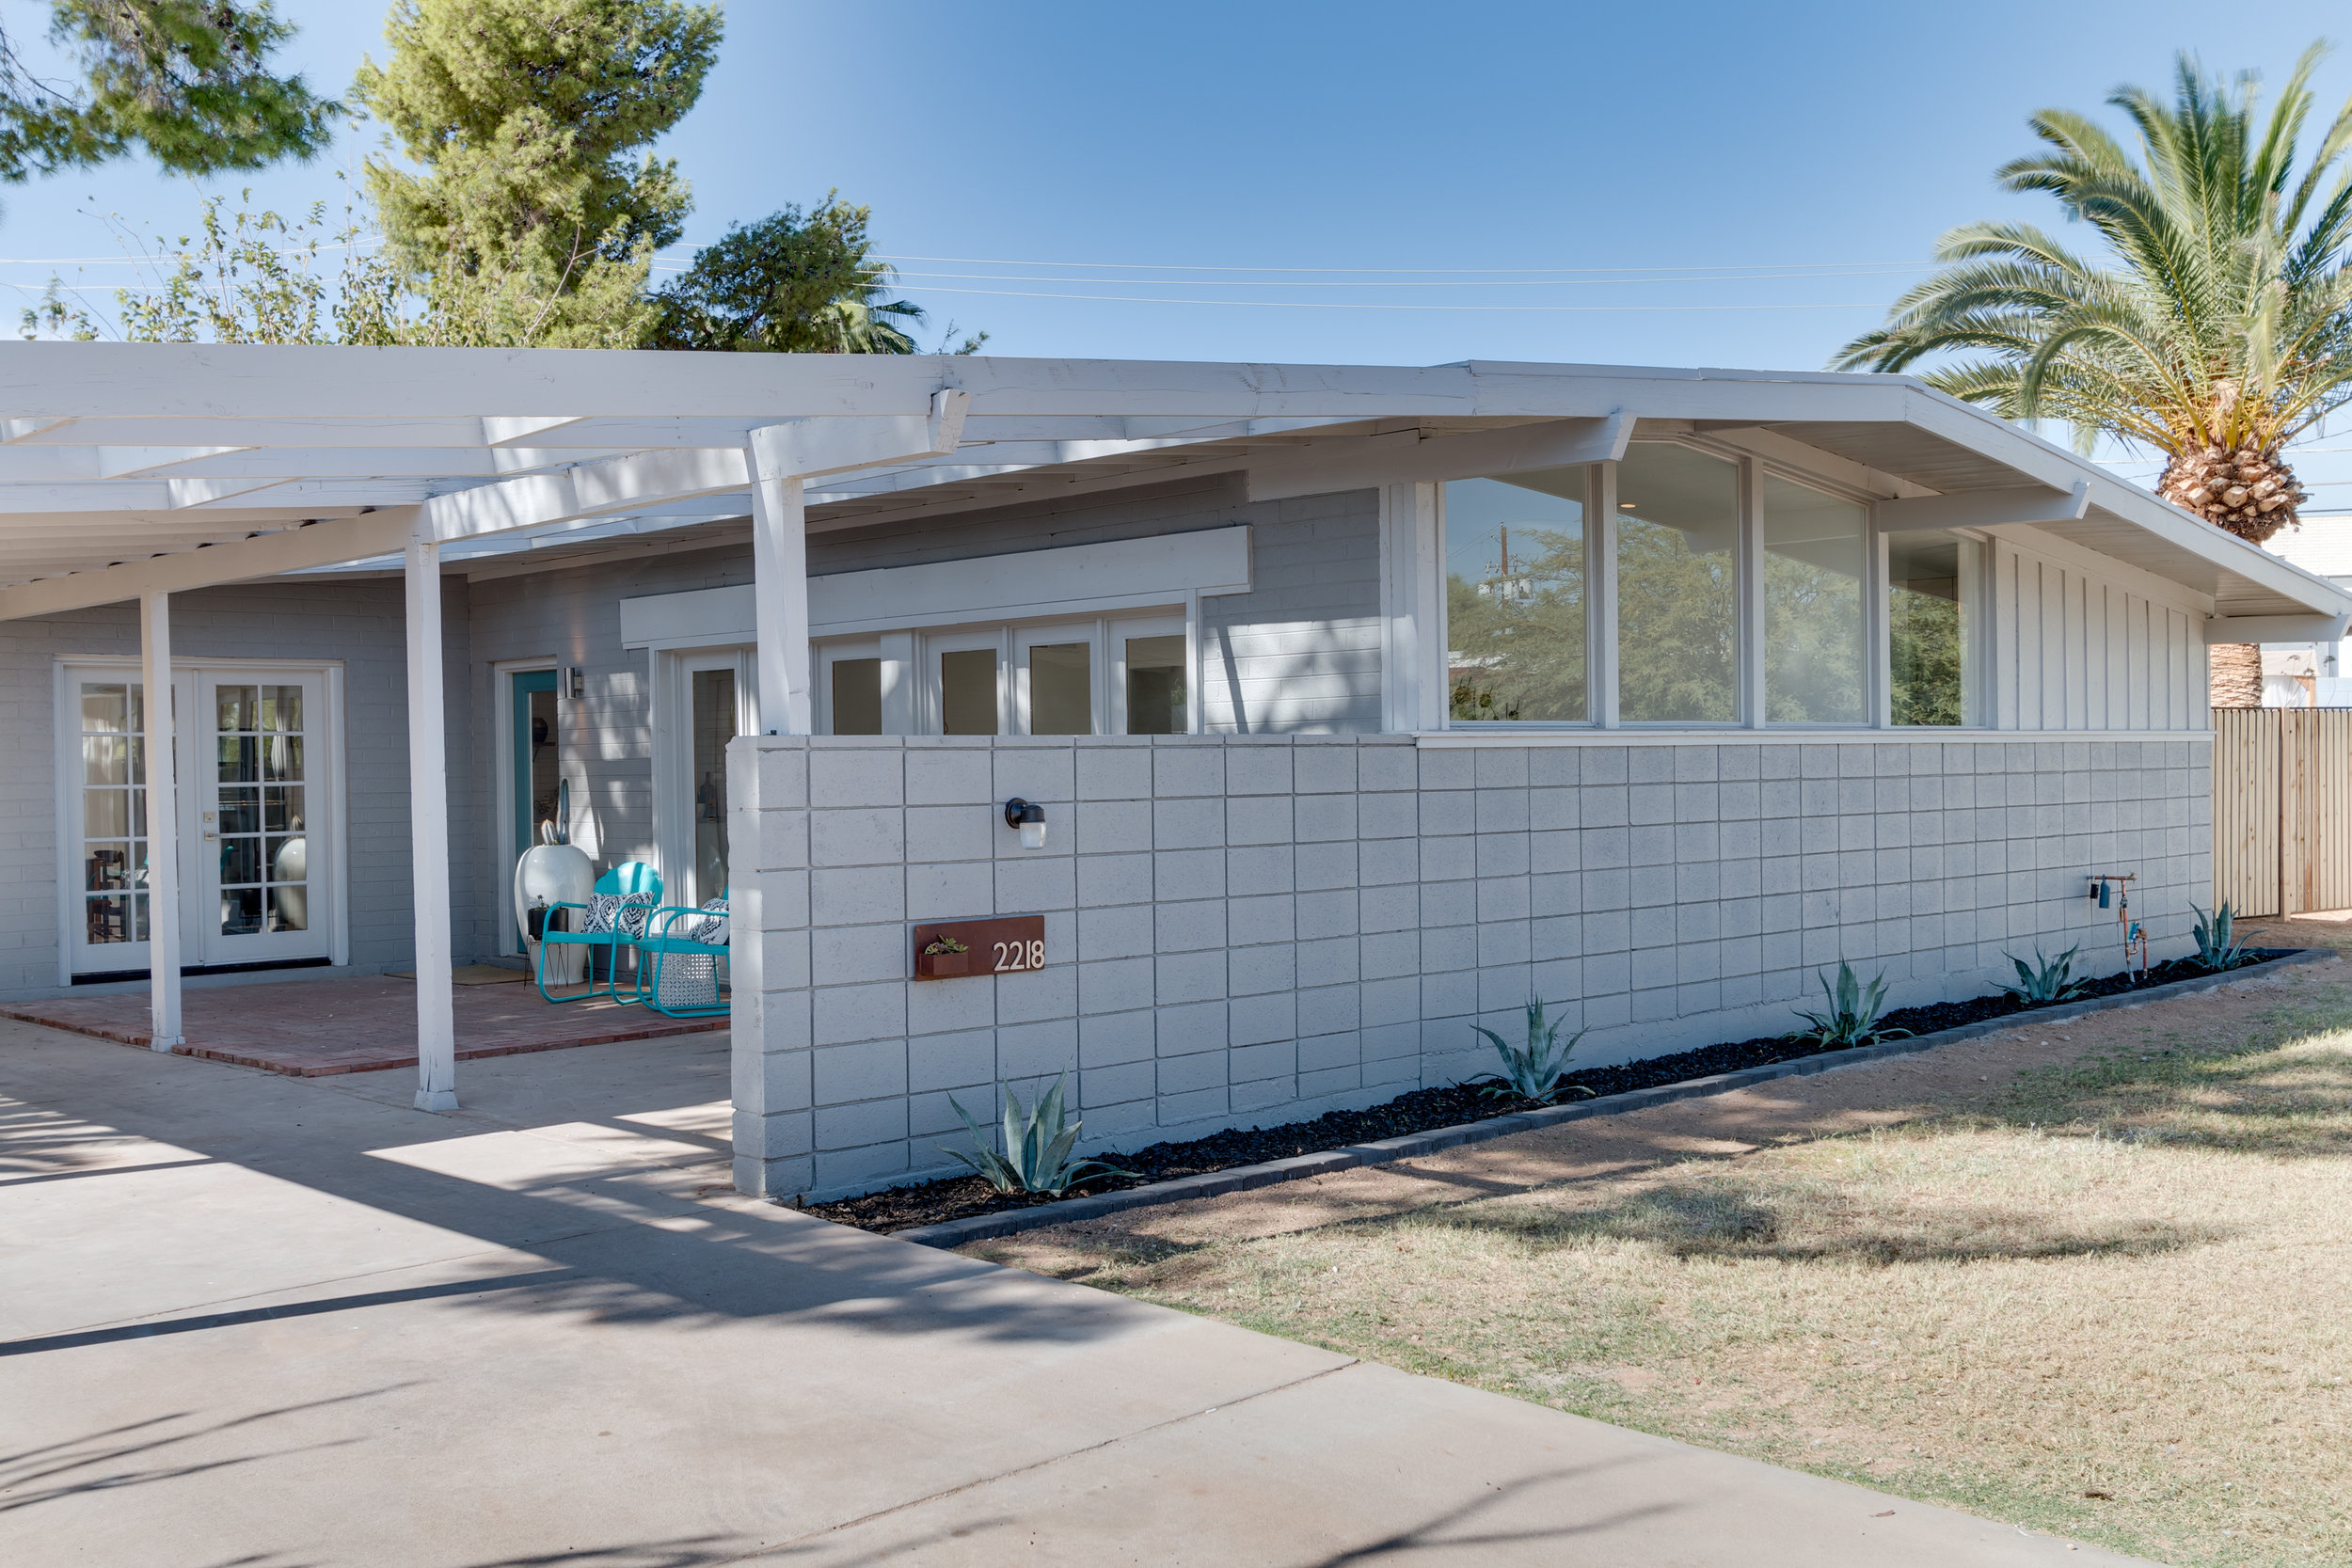 My second renovation in Scottsdale.